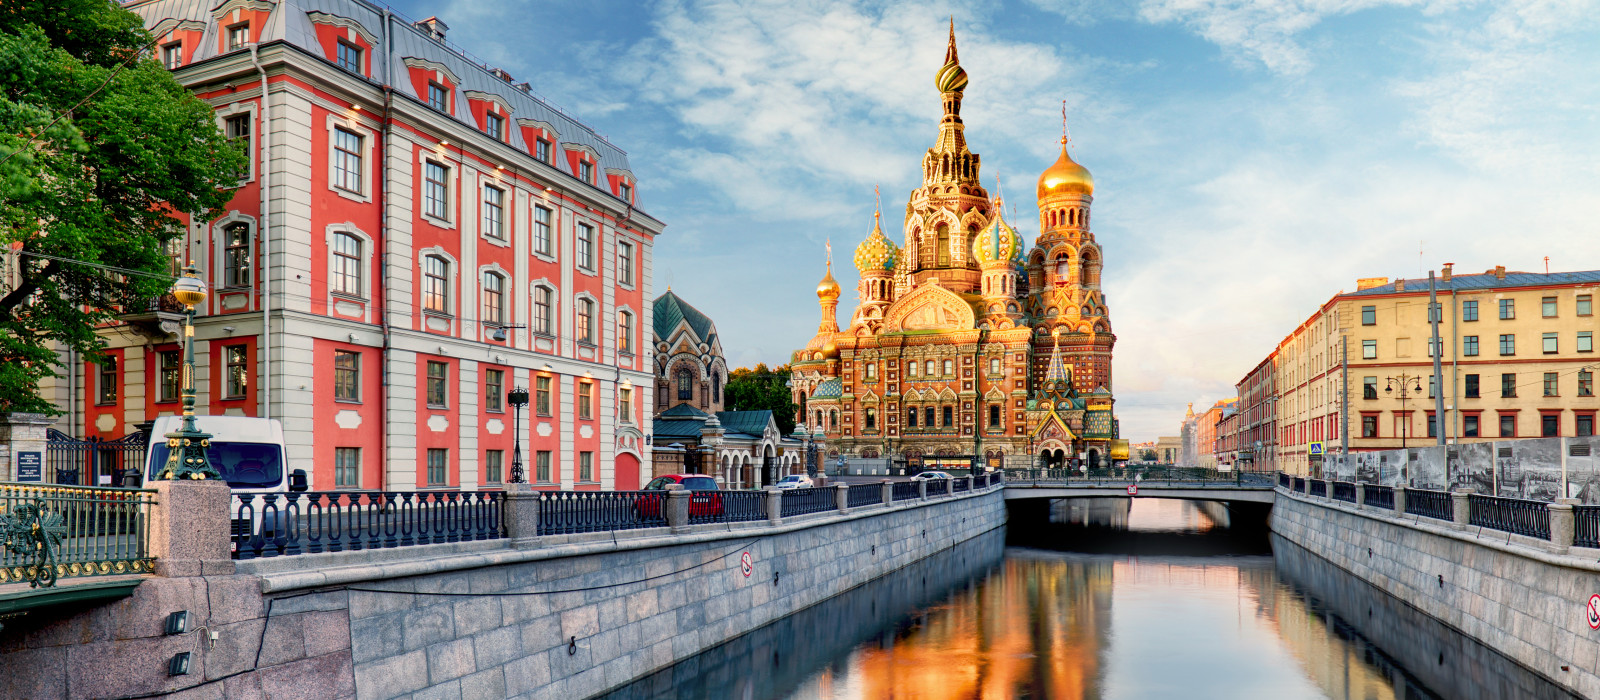 Reiseziel Sankt Petersburg Russland